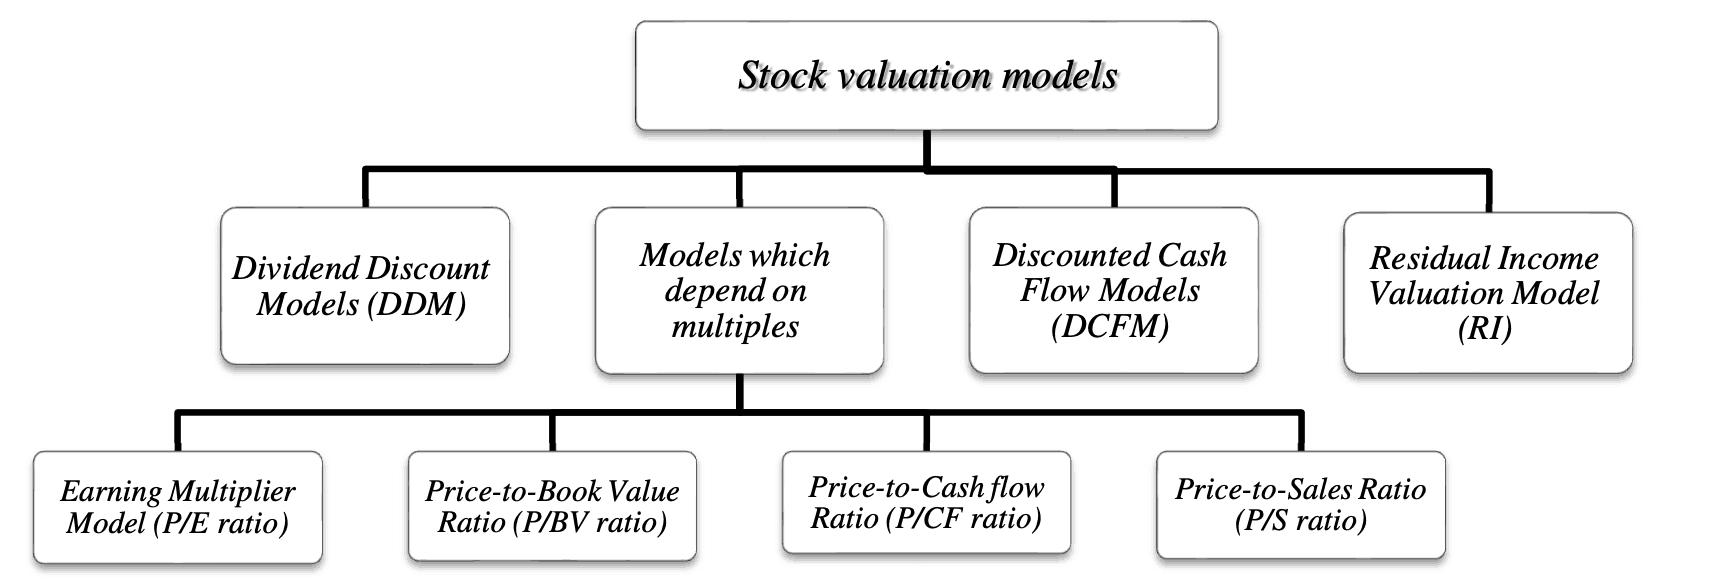 stock valuation model